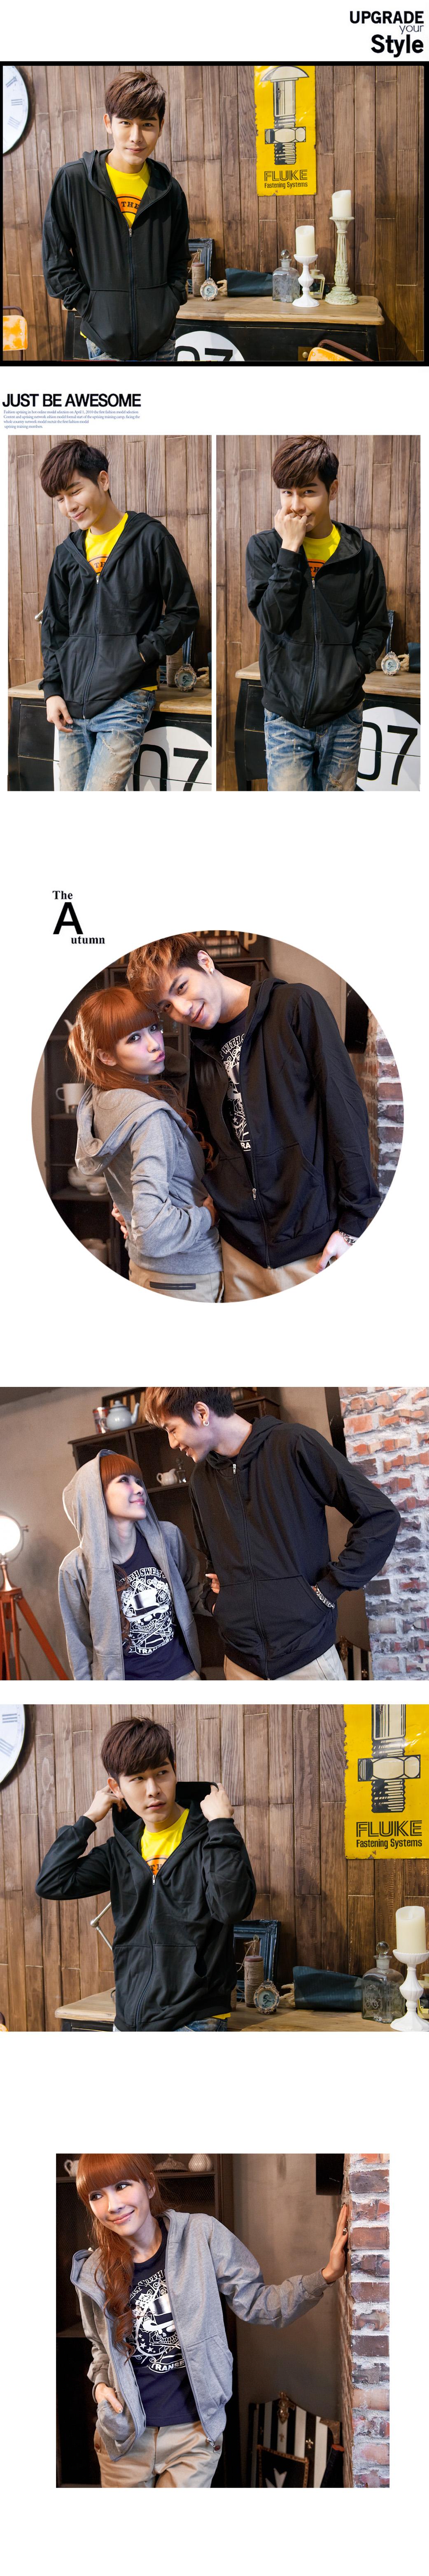 MIT台灣製 潮流外套 舒適 連帽  磨毛 素面  全素面連帽外套【YJ0001】艾咪e舖.女/男尺寸S~XL